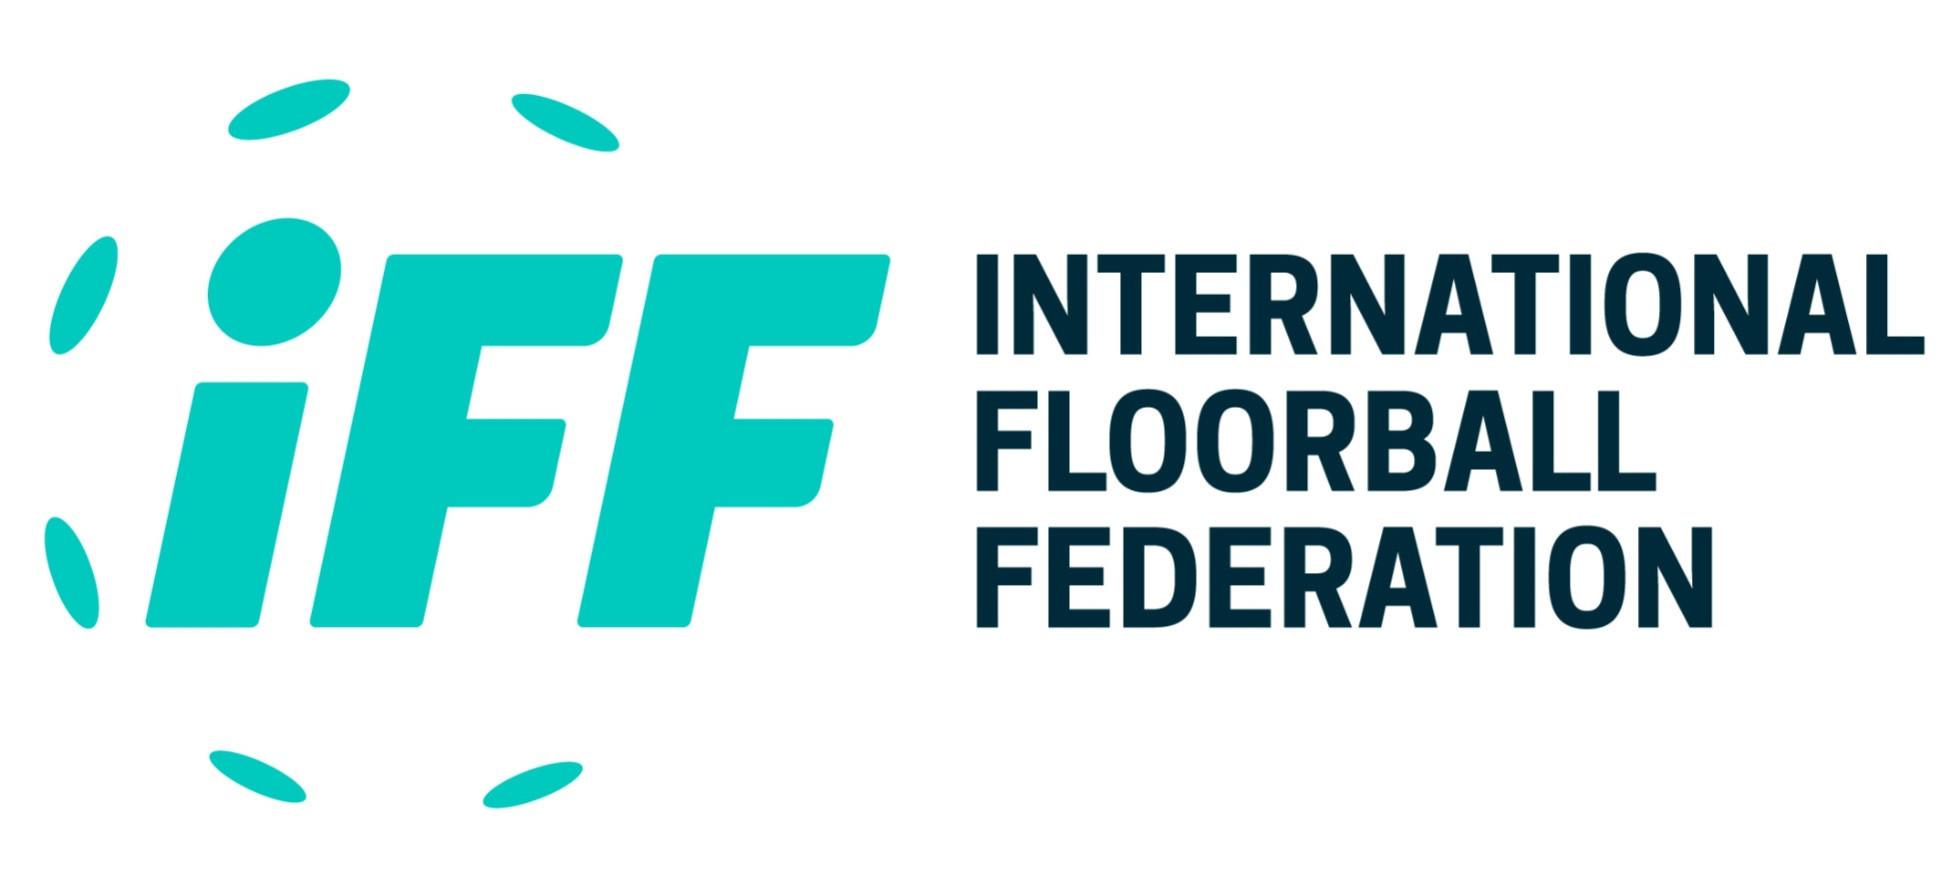 CONCORDIA announced as main sponsor of 2022 Men's World Floorball Championships